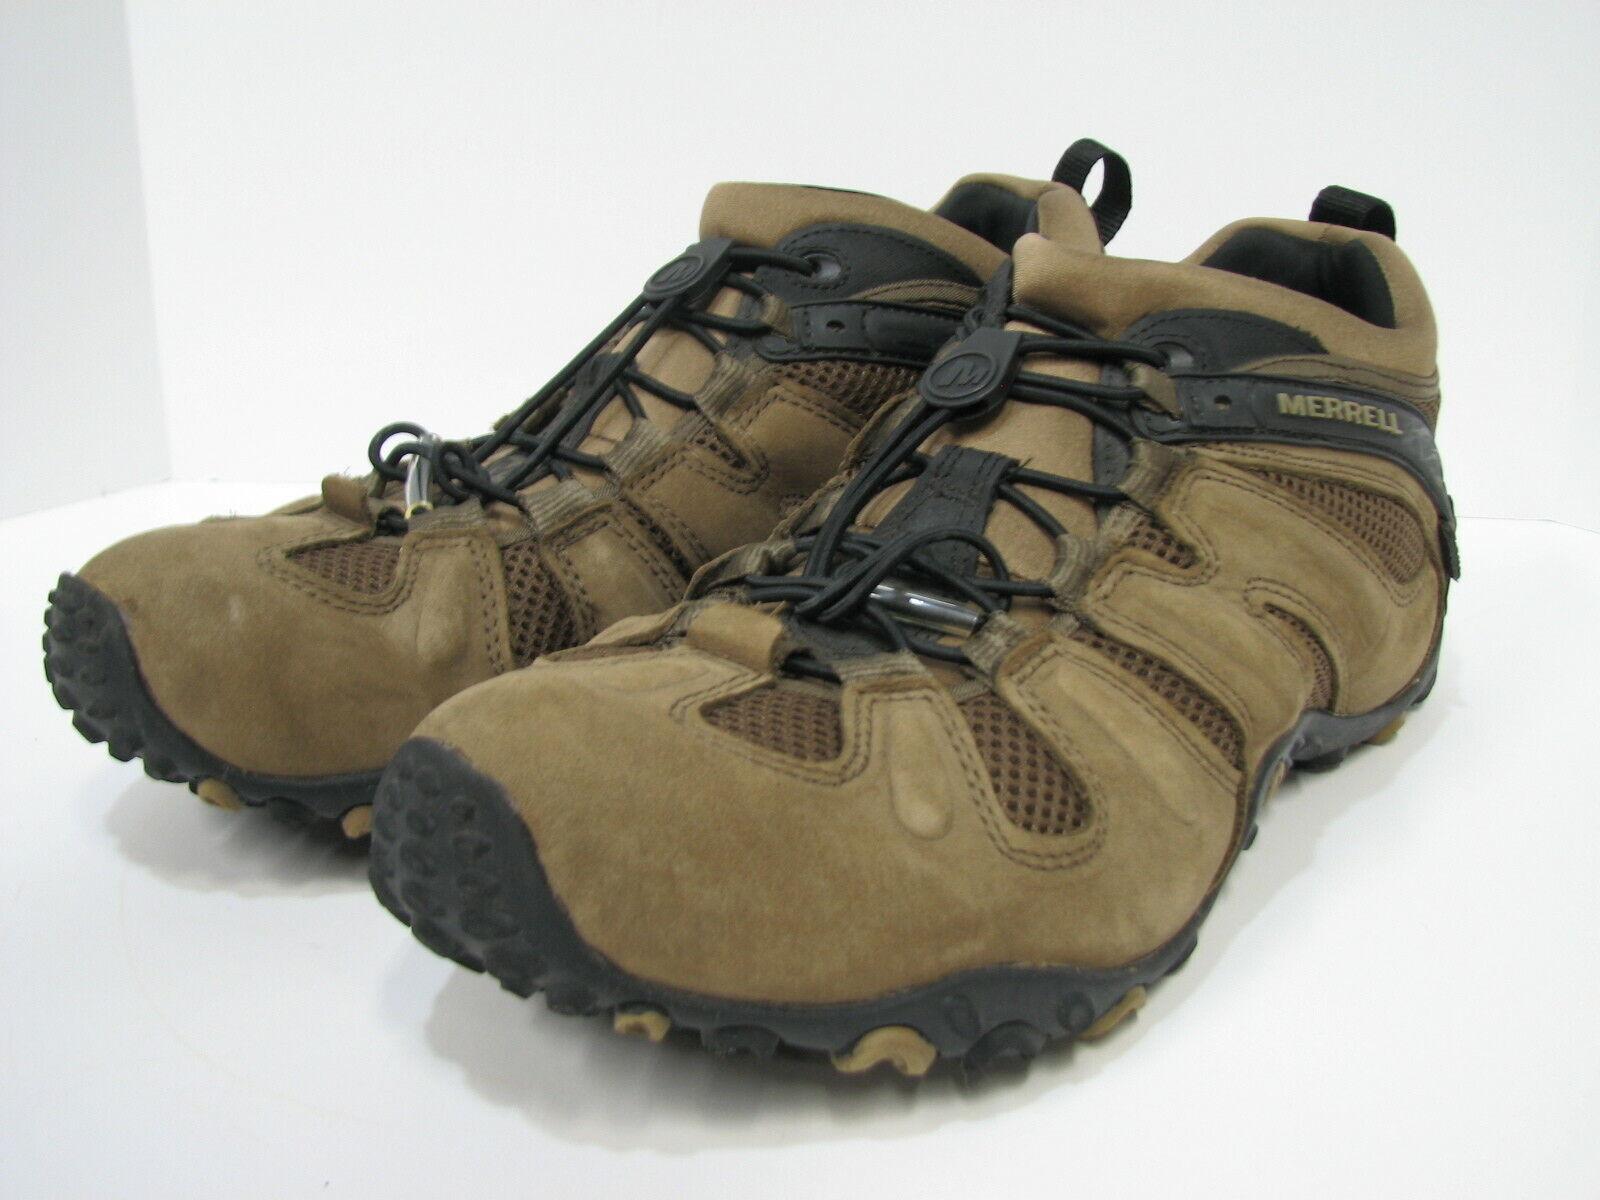 154b3f71a950a Merrell J21401 Mens Hiking shoes Size 13 Chameleon Prime Stretch Kangaroo  Watprf